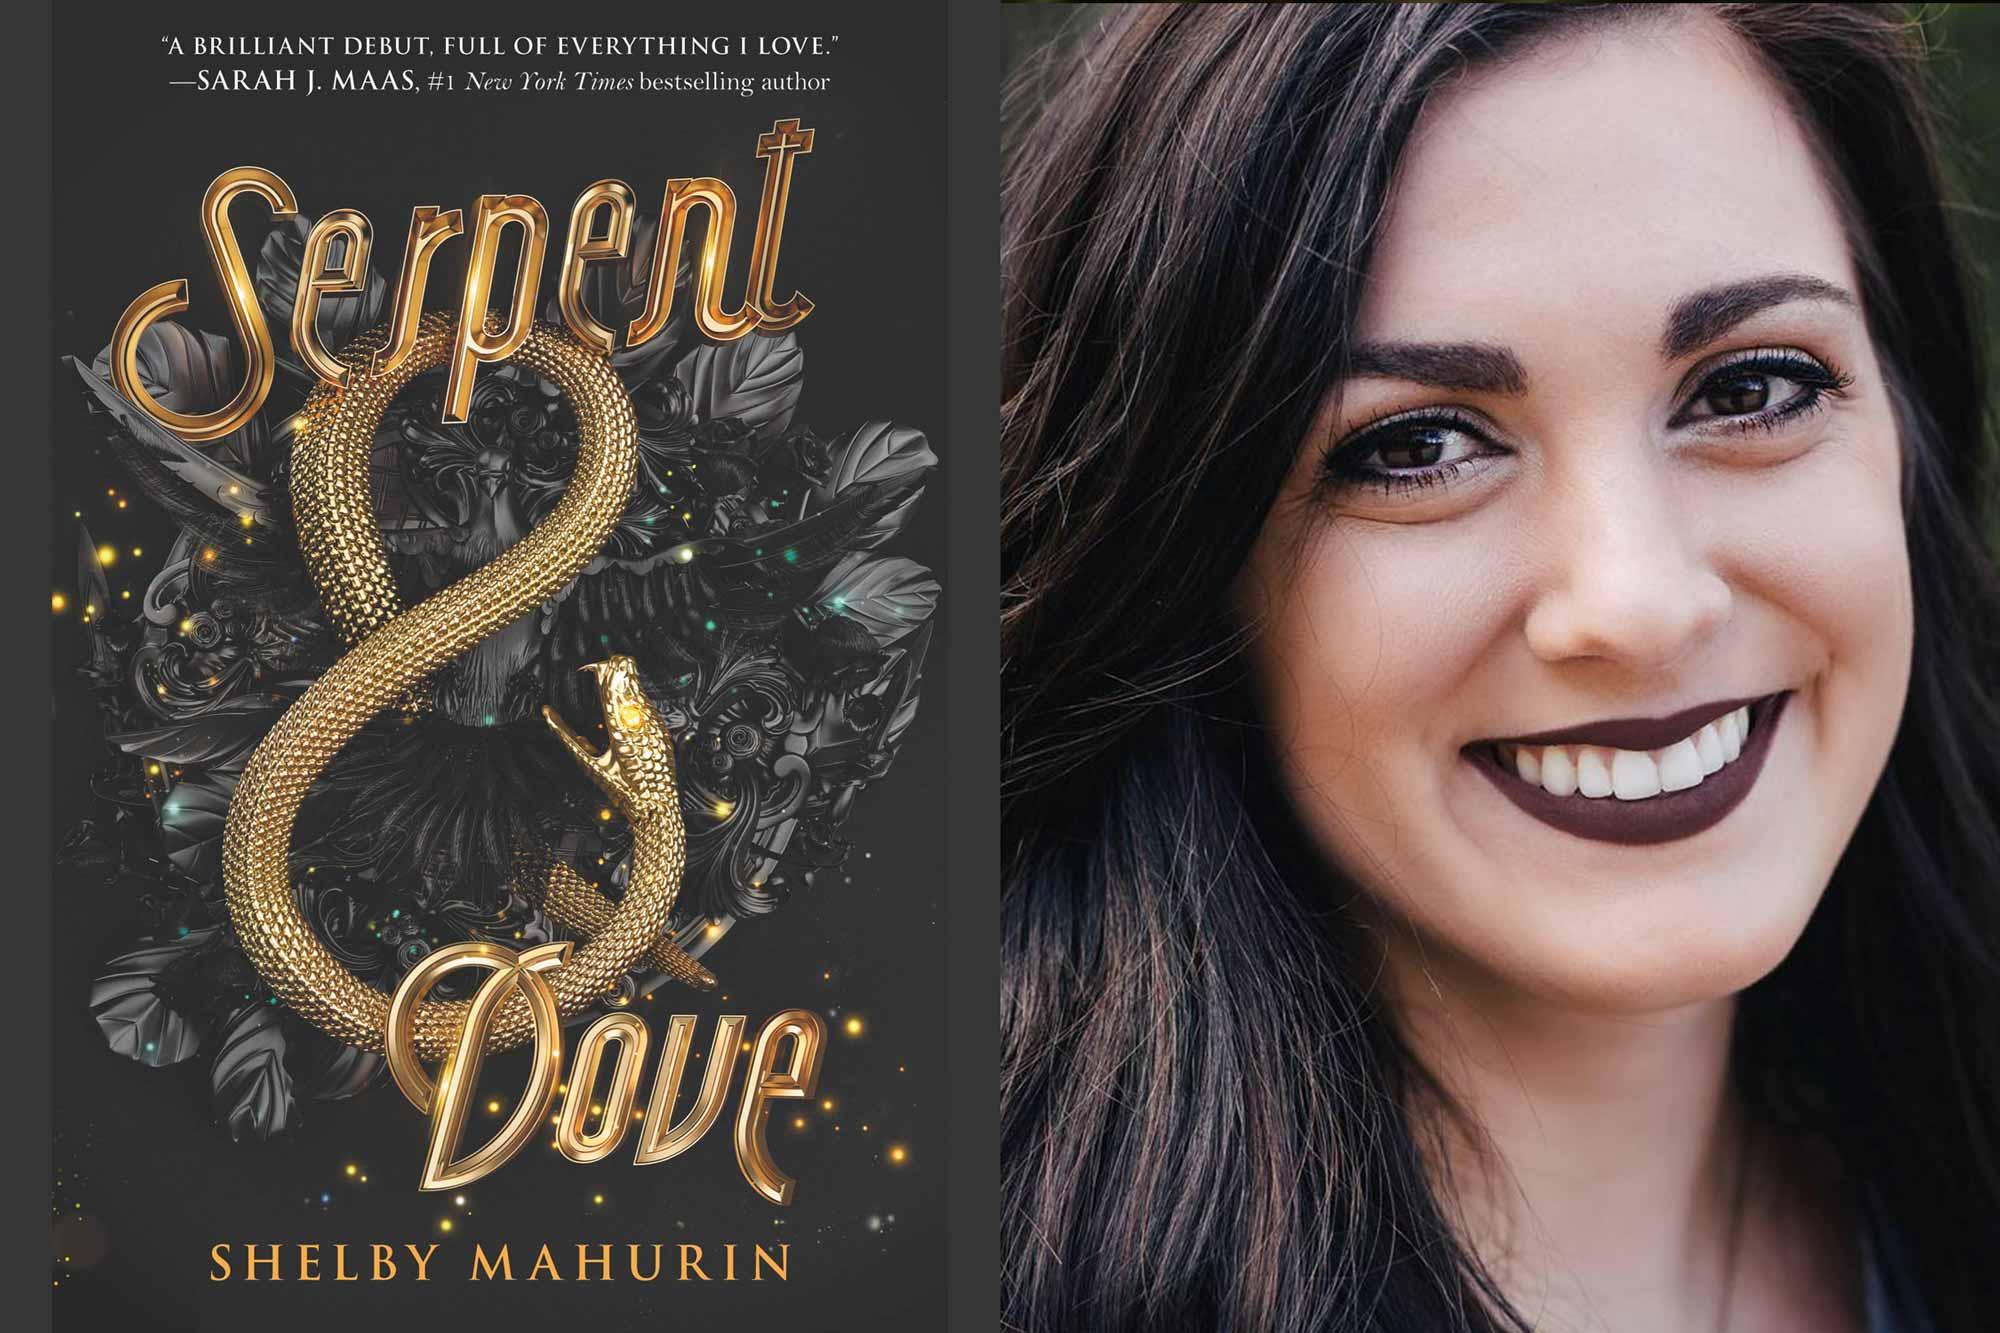 Shelby Mahurin on Serpent & Dove